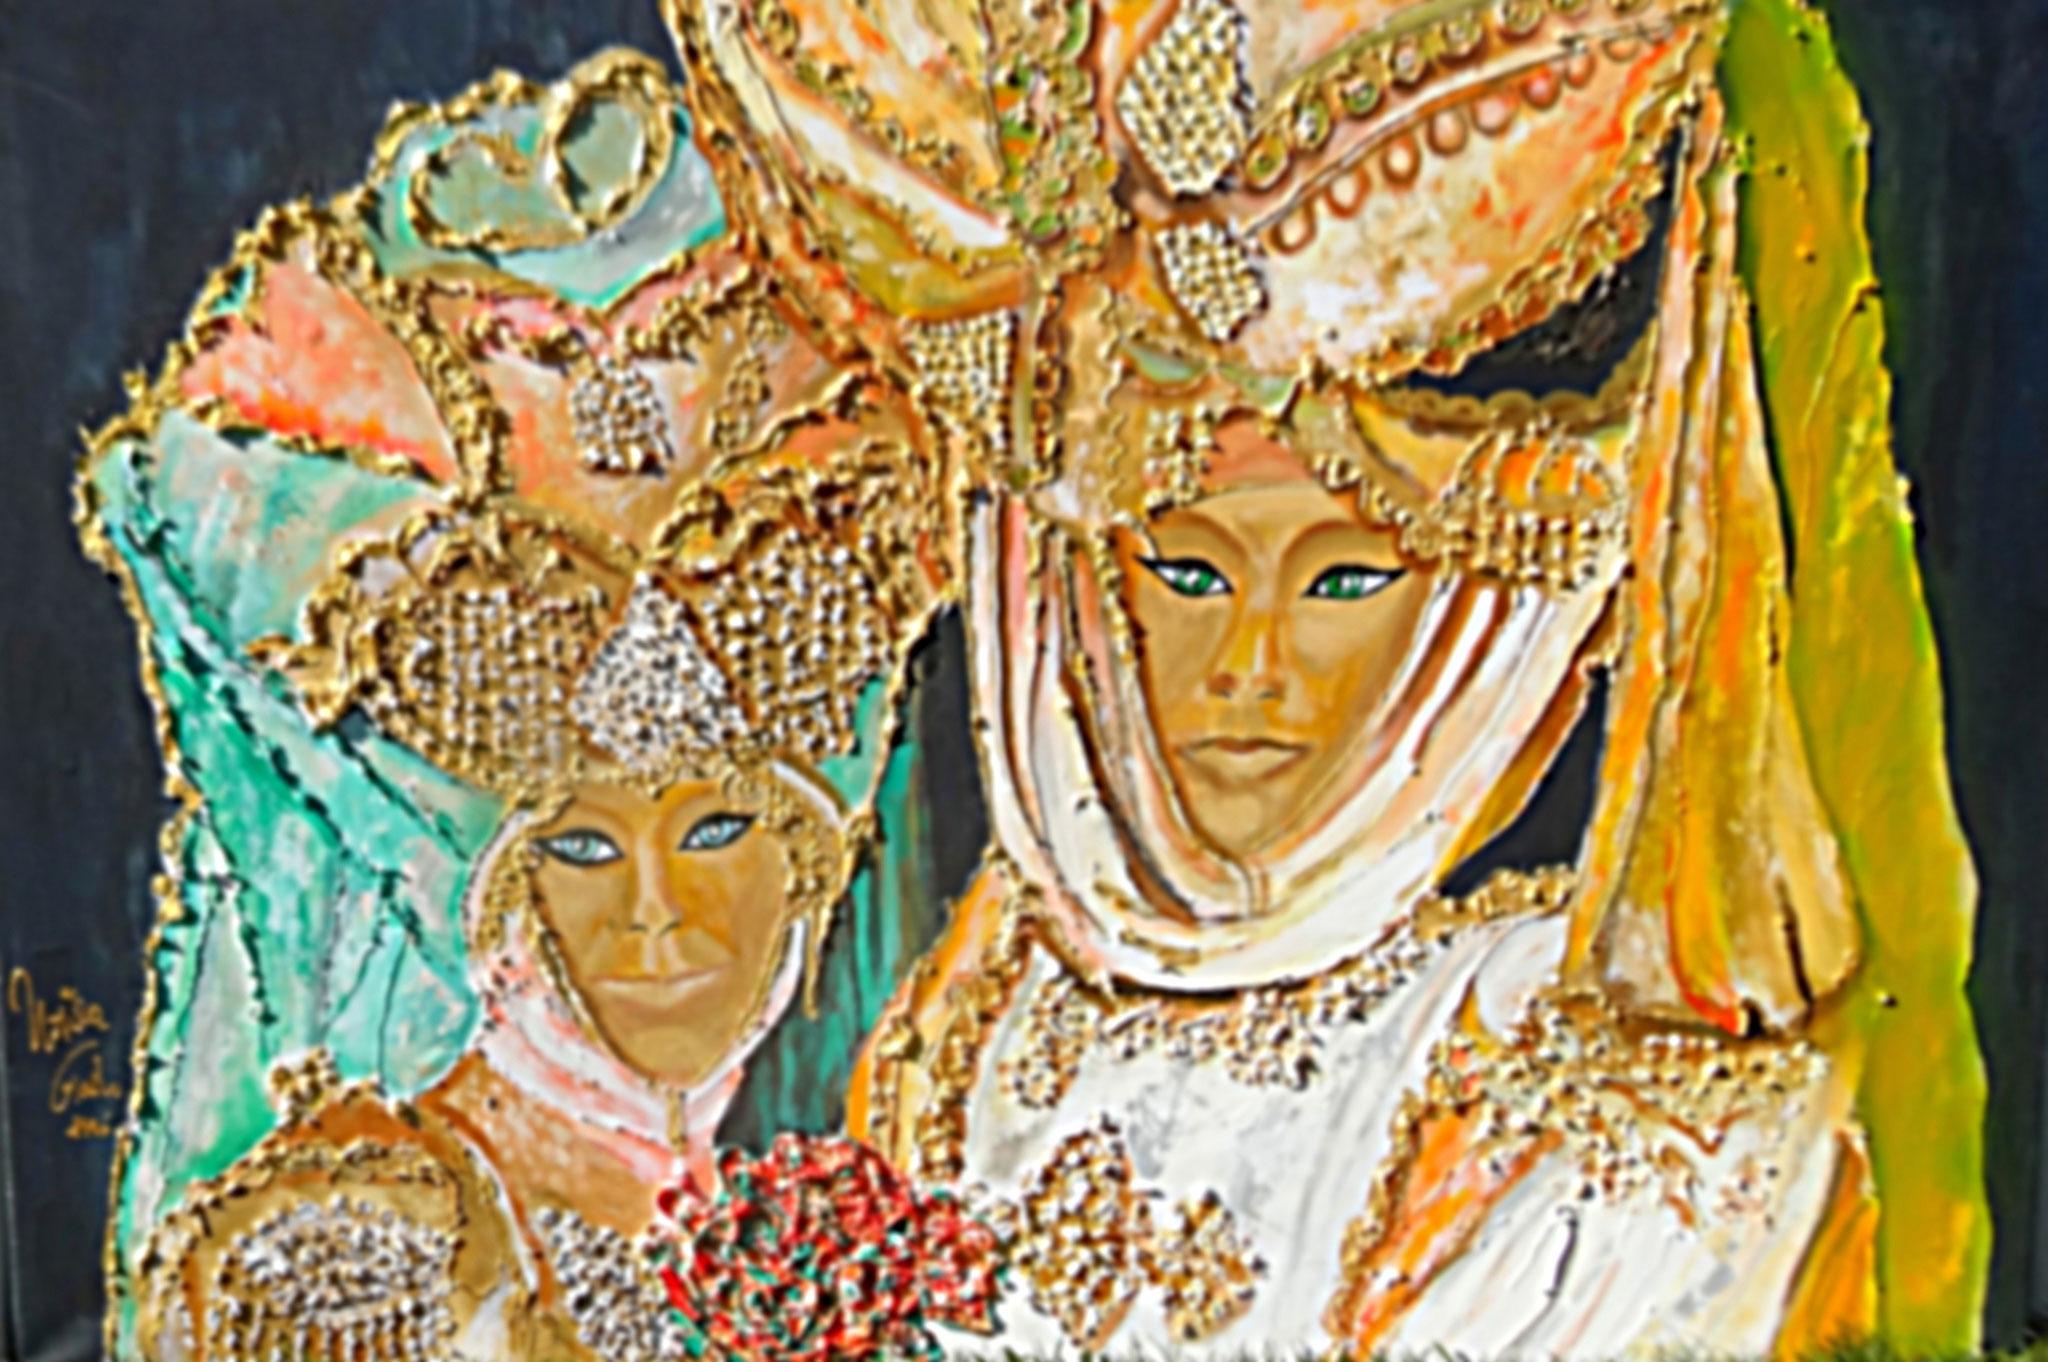 Karneval in Venedig     (Technik:  Acryl/Mixed Media    Leinwand: 1,20 m X 90 cm)